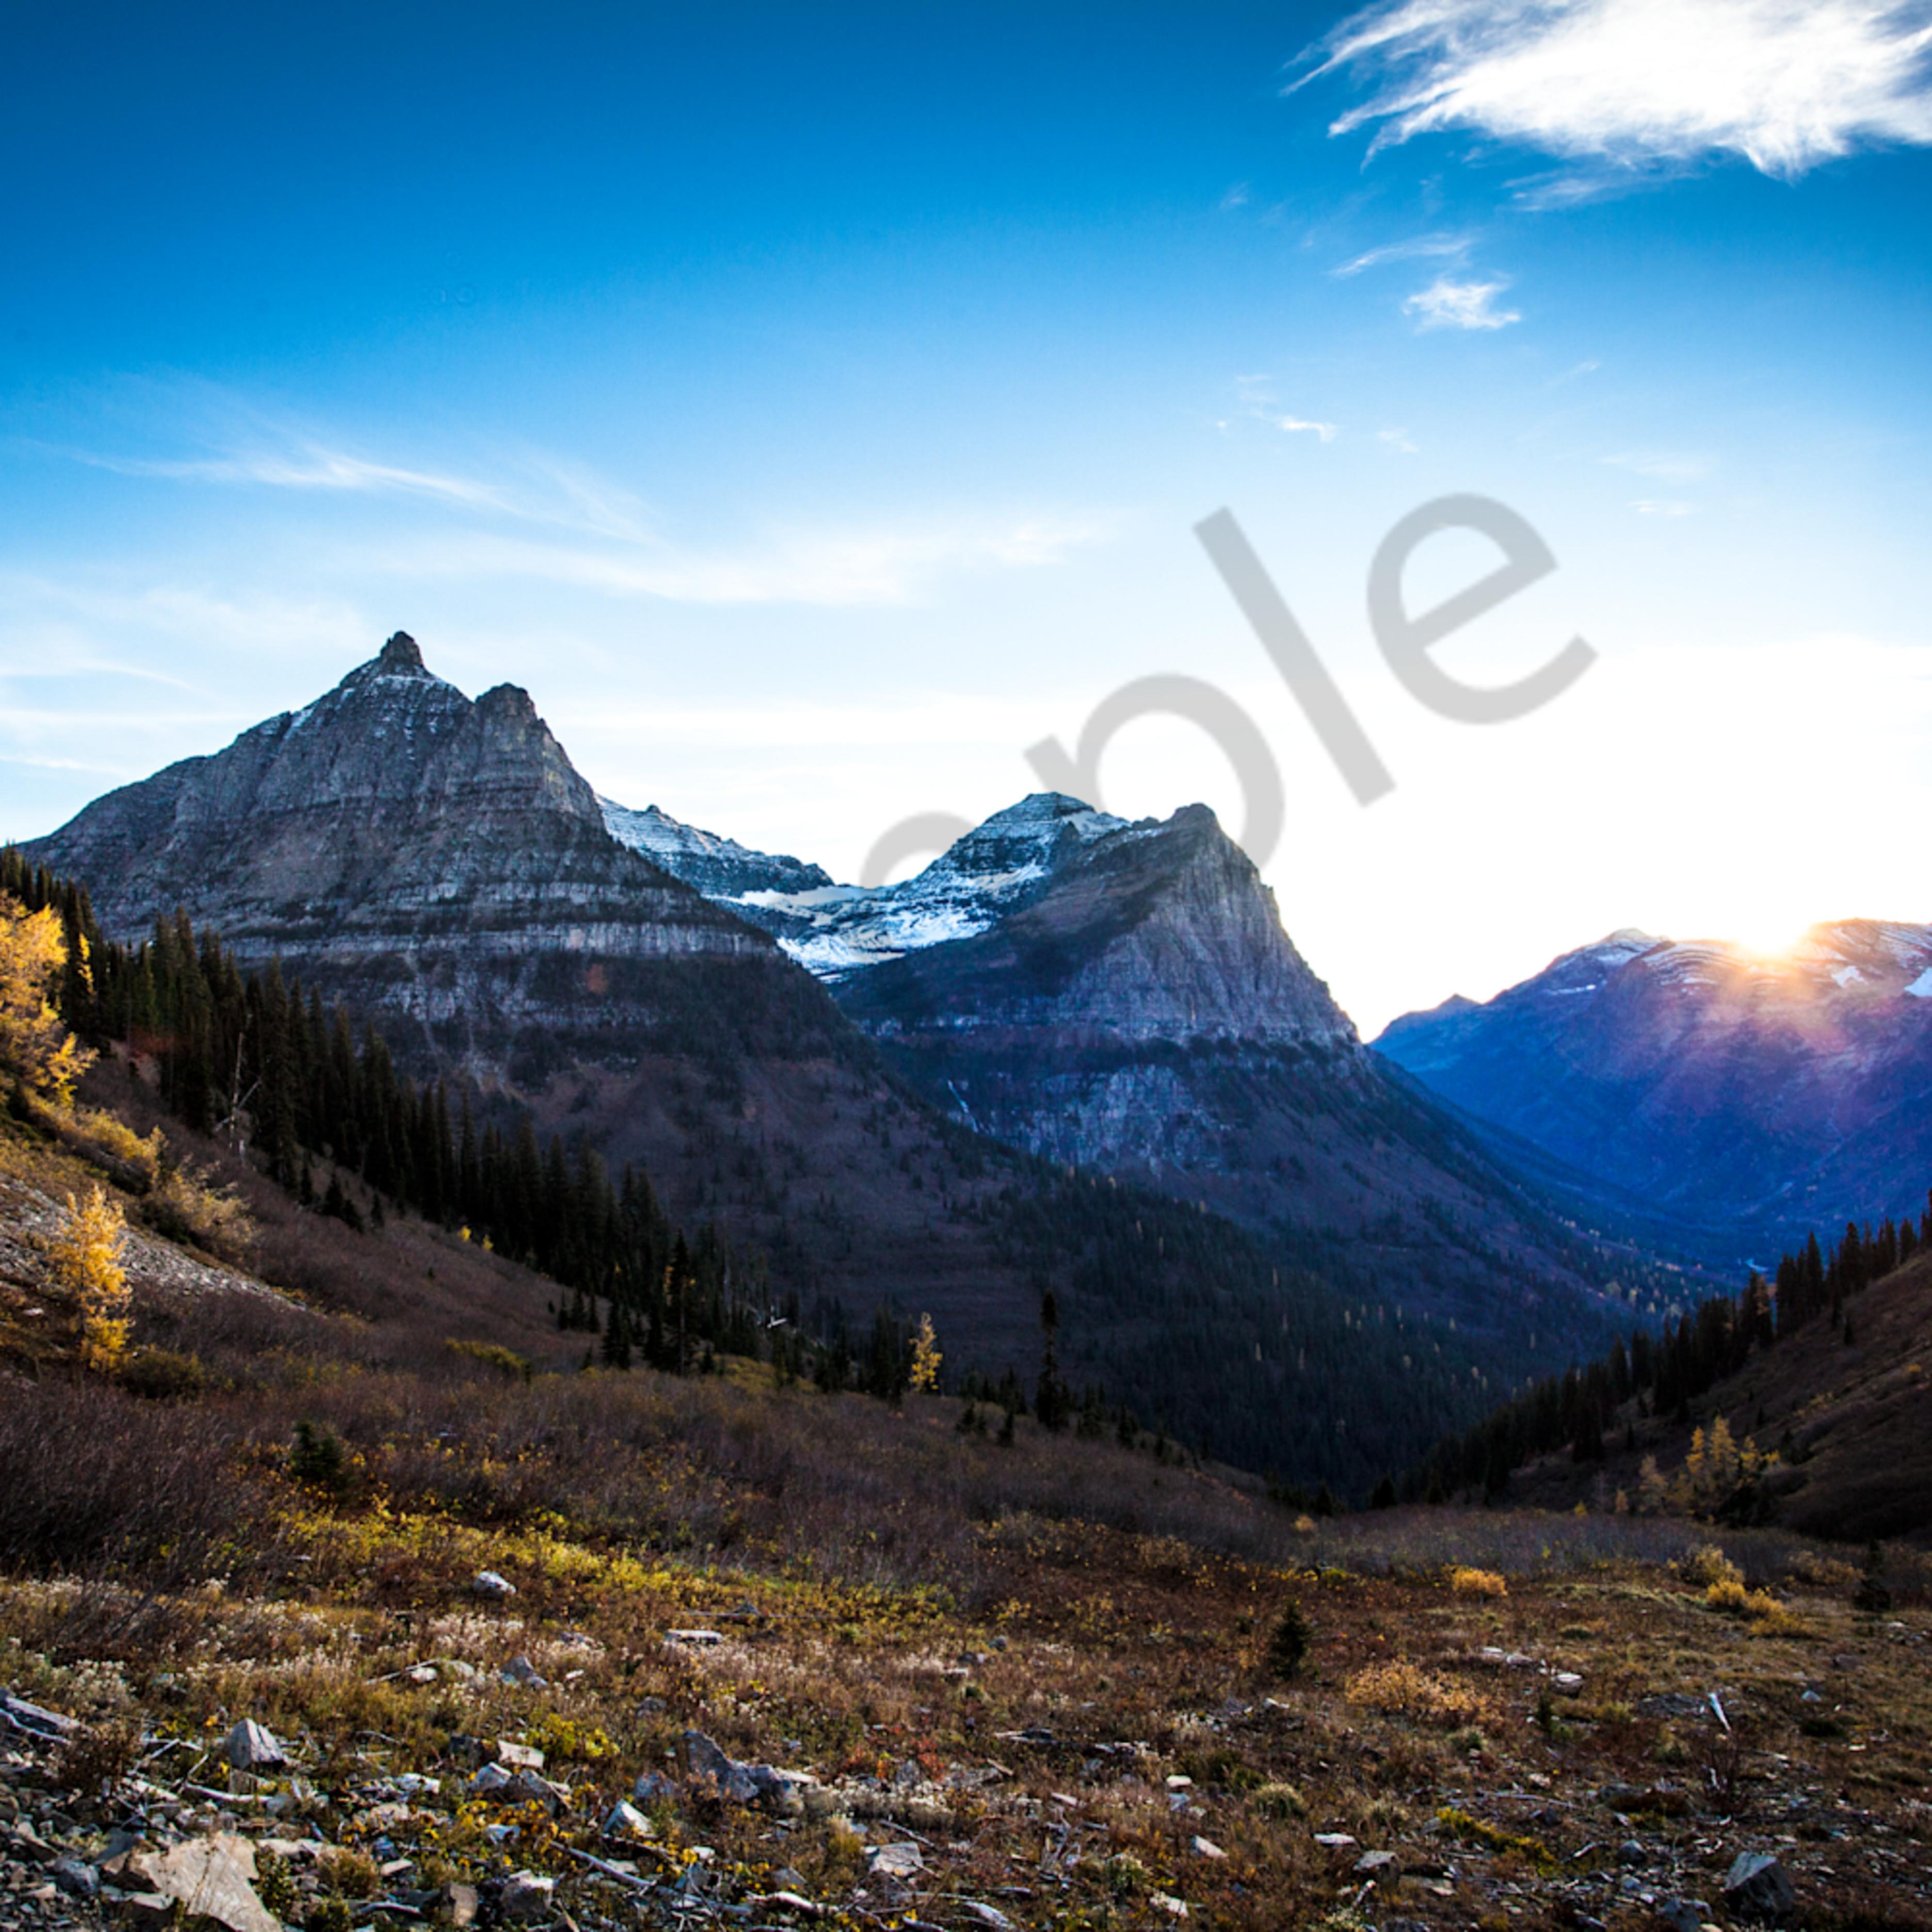 Montana mountains snowpeaks sunset nationalpark horizontal p5fppl